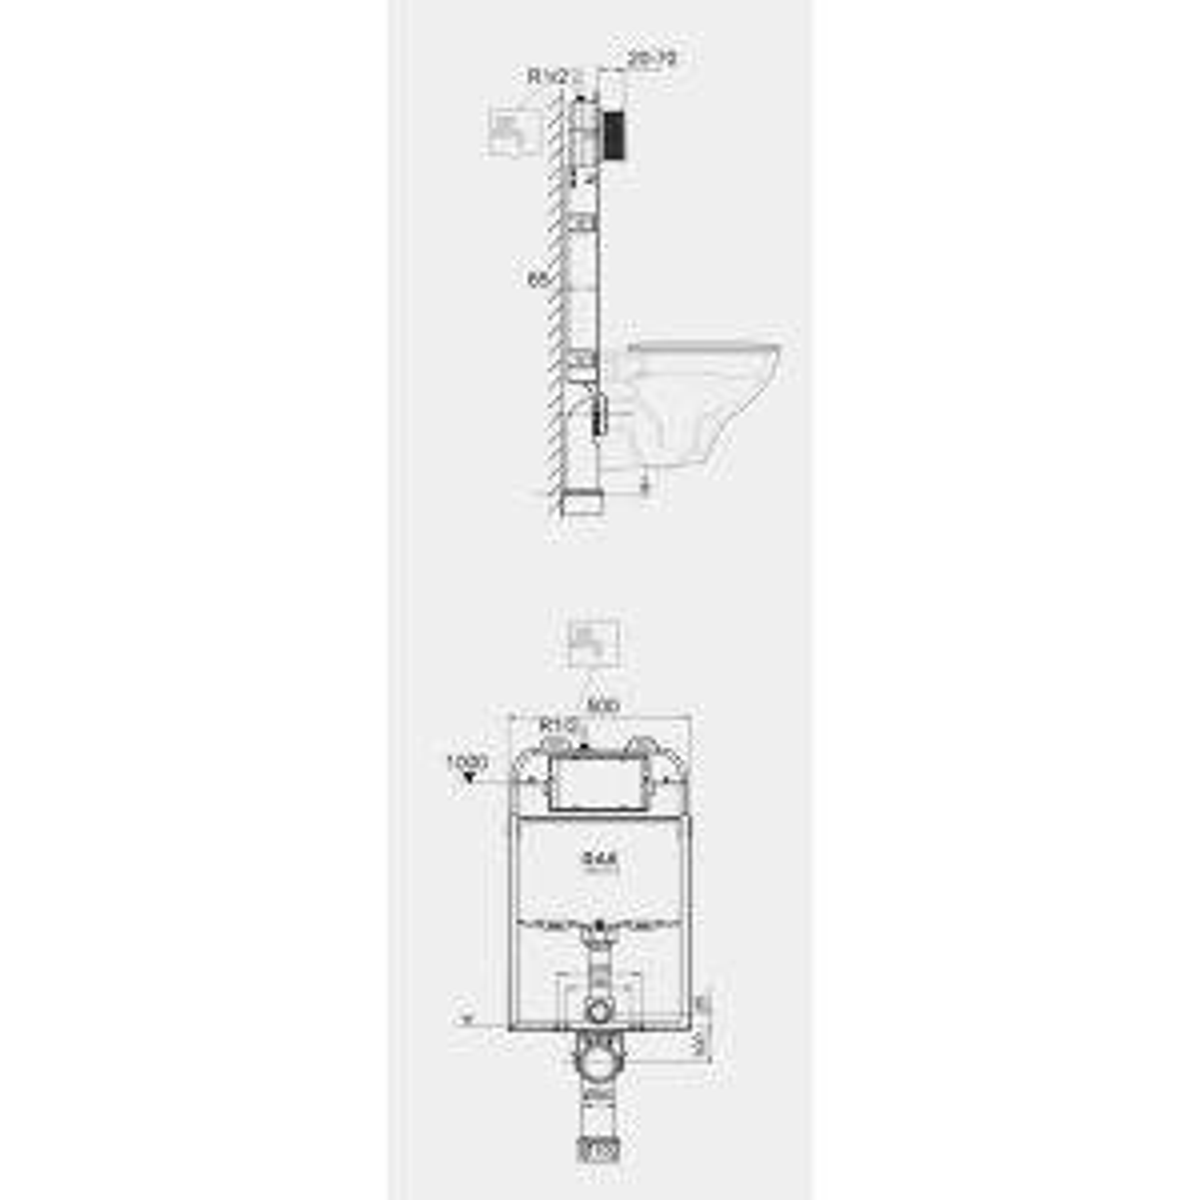 RAK Ecofix Slimline Concealed Cistern 500 x 1140mm Measurements